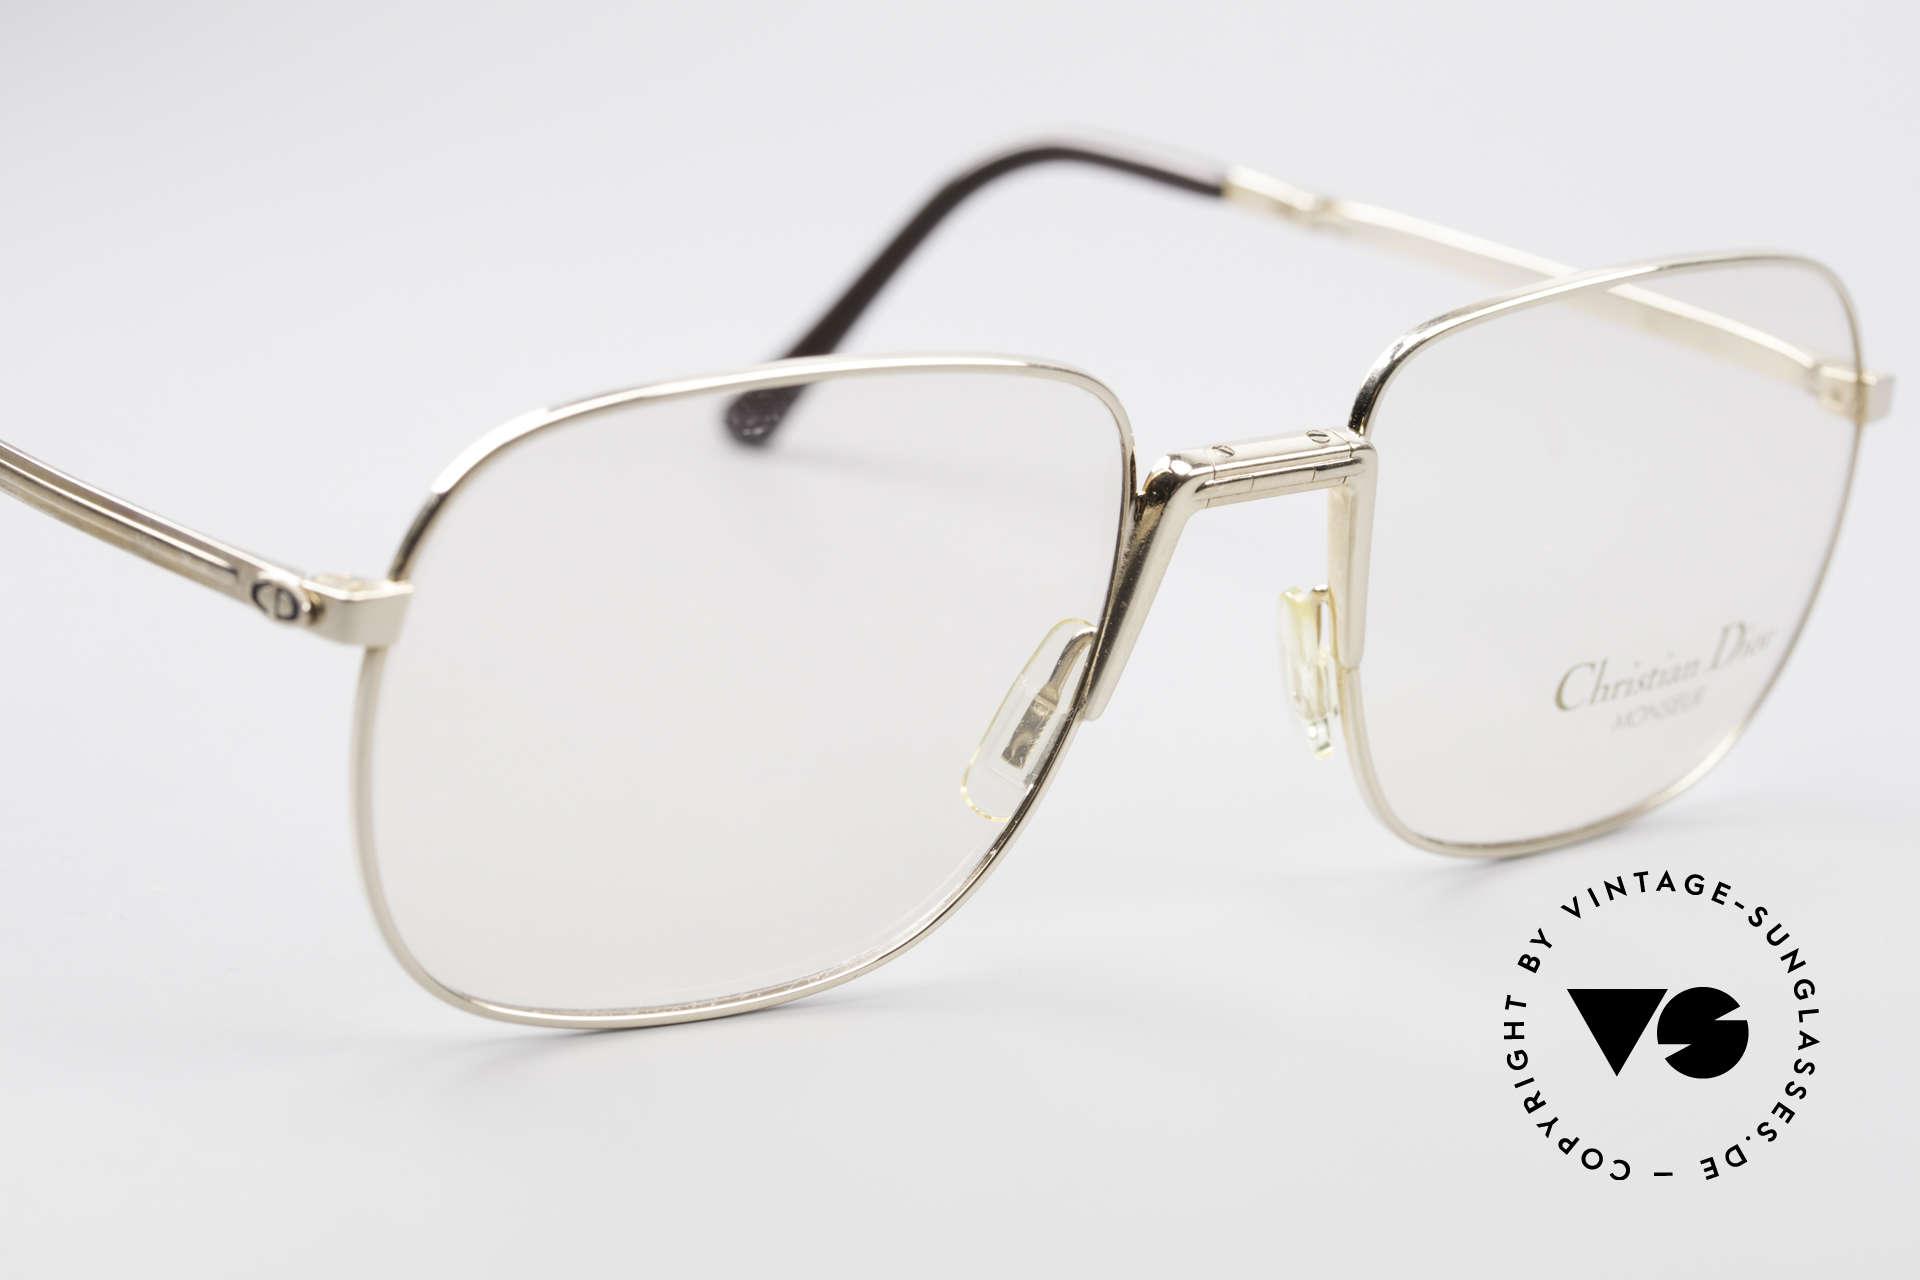 Christian Dior 2288 Monsieur Folding Eyeglasses, NO RETRO FASHION, but a 30 years OLD ORIGINAL!, Made for Men